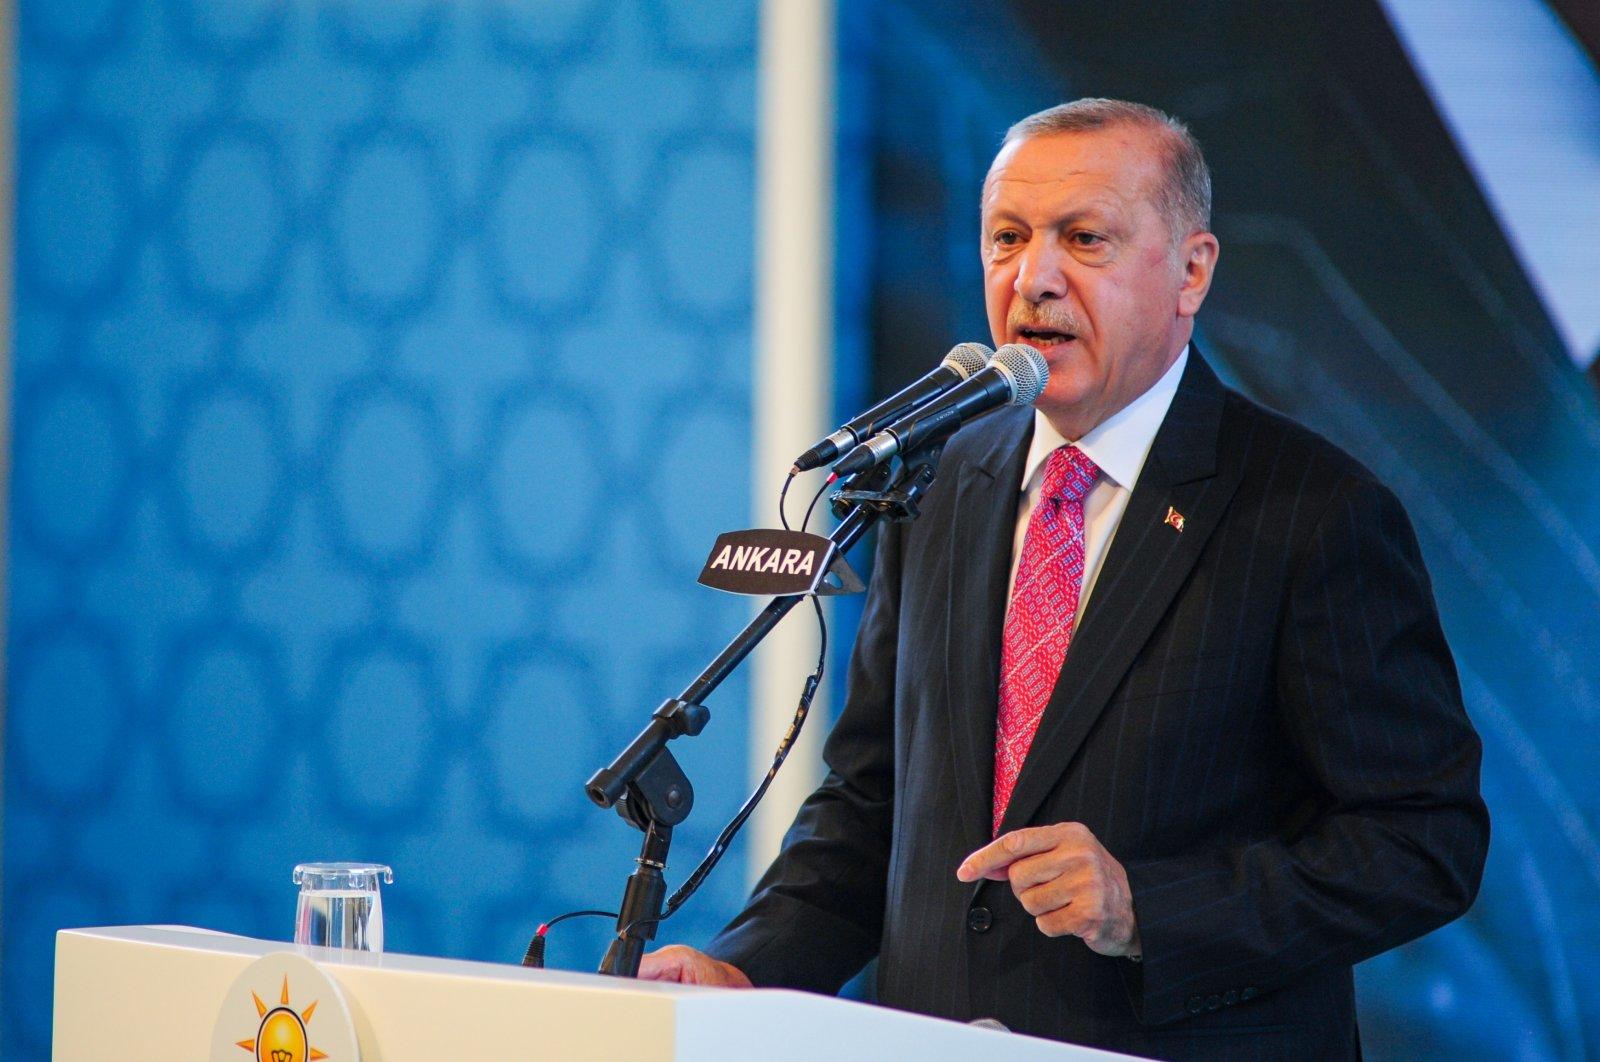 President Recep Tayyip Erdoğan speaks at the Justice and Development Party's (AK Party) 19th anniversary celebrations in Ankara, Turkey, Aug. 13, 2020. (IHA Photo)